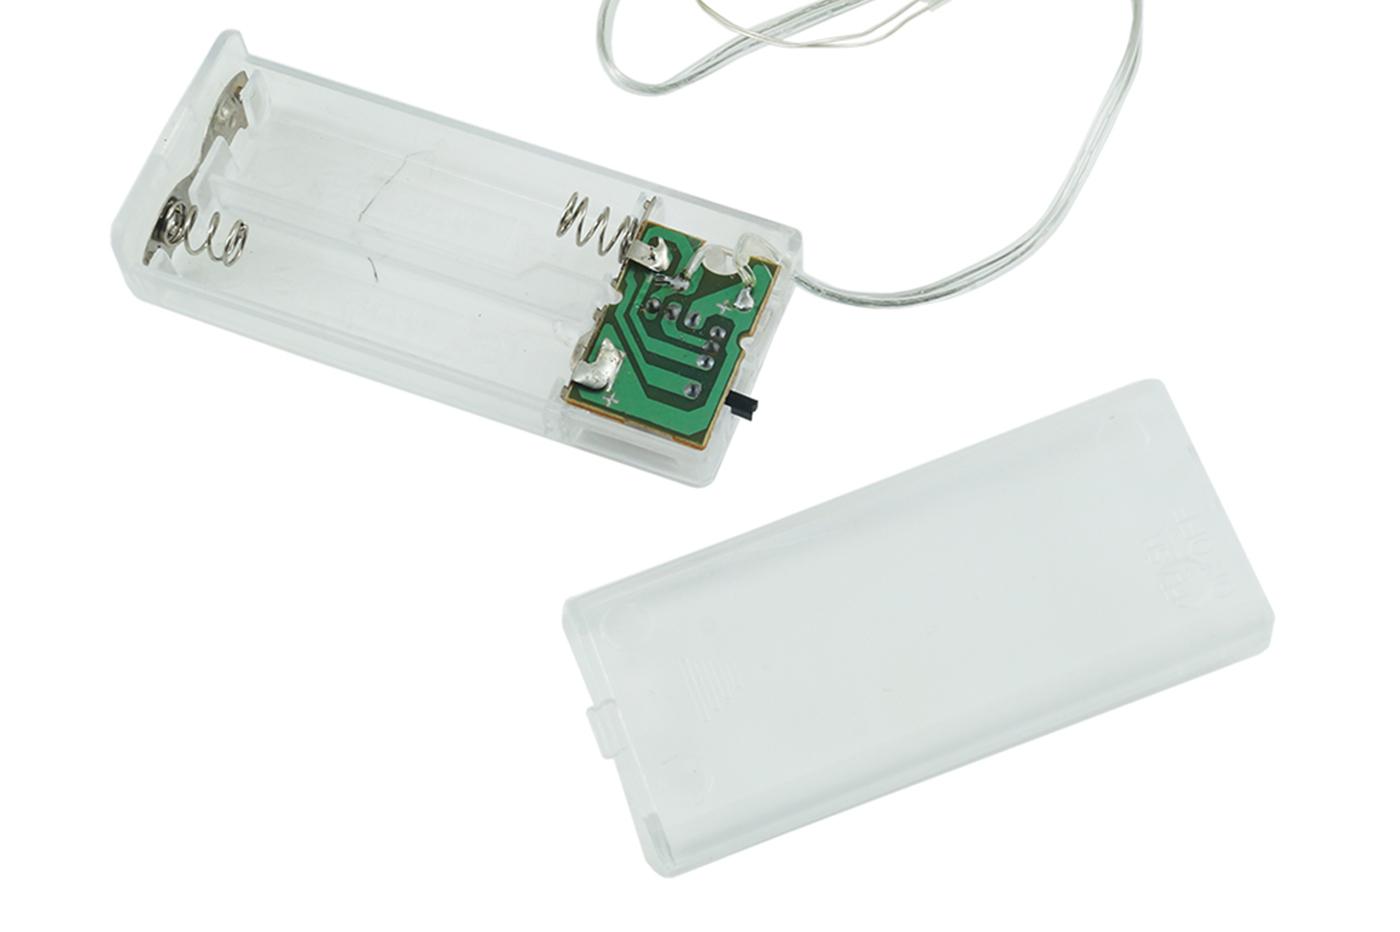 Plafoniera Led Luce Fredda : Pannello led 40x40 36 watt plafoniere luce fredda lampada cornice